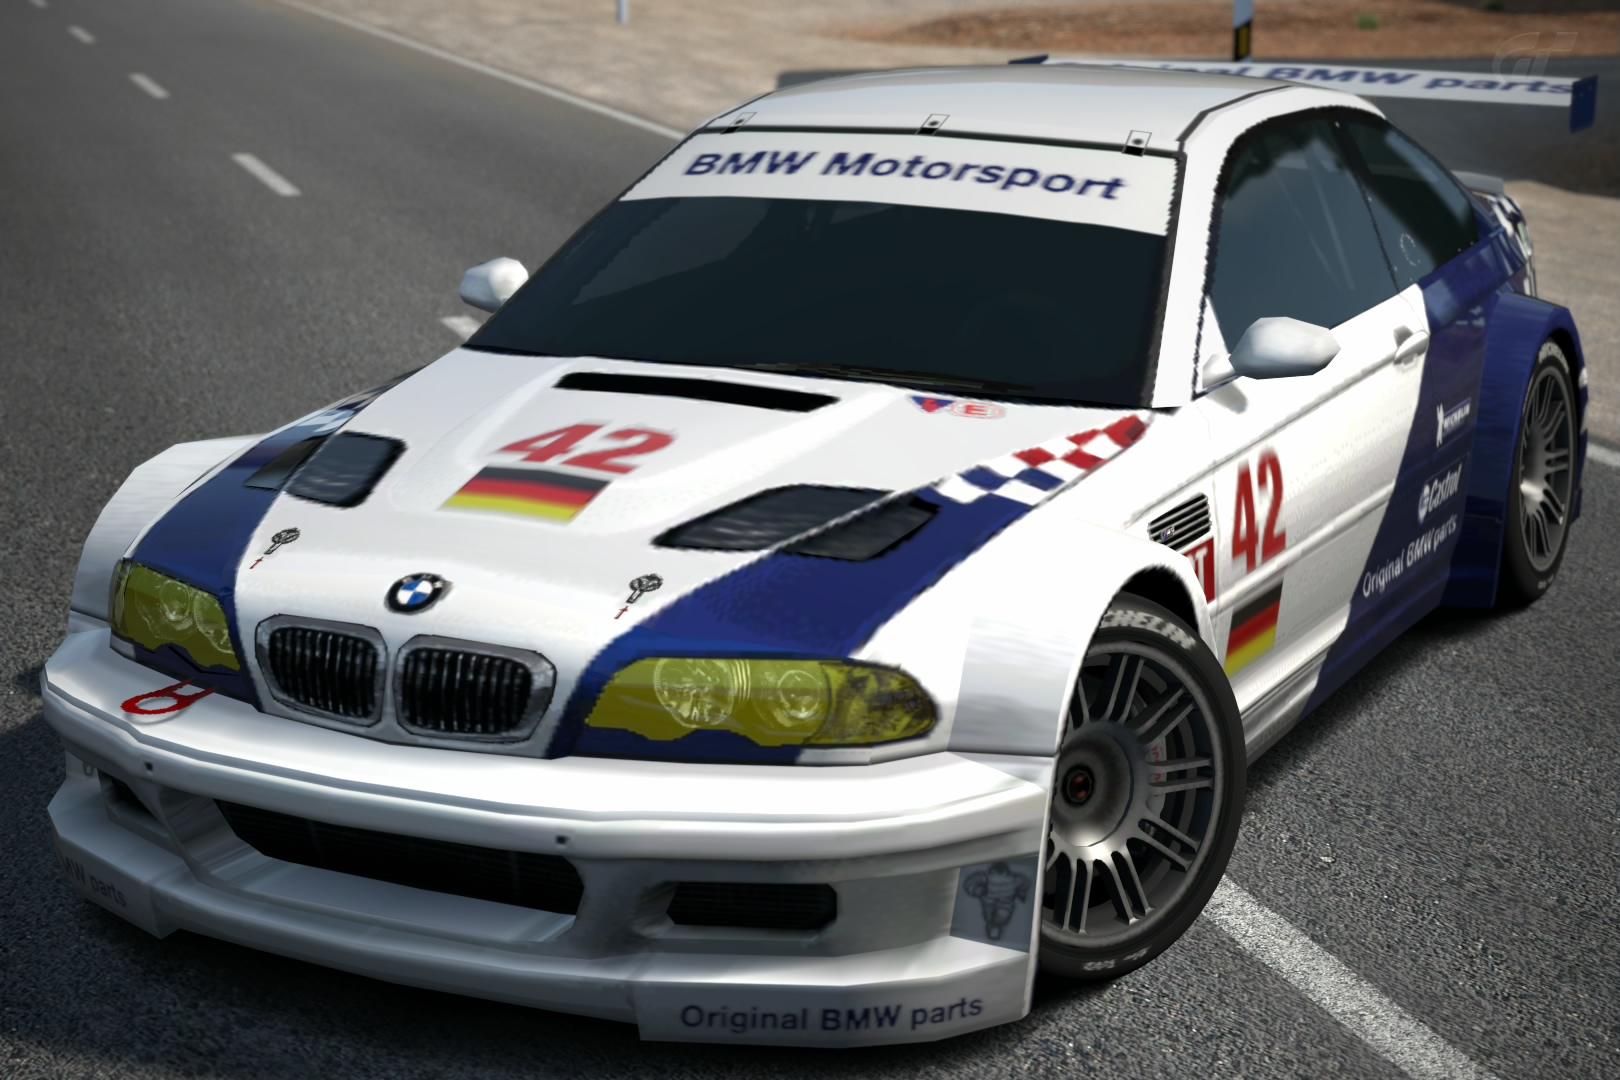 BMW M3 GTR Race Car '01 | Gran Turismo Wiki | Fandom